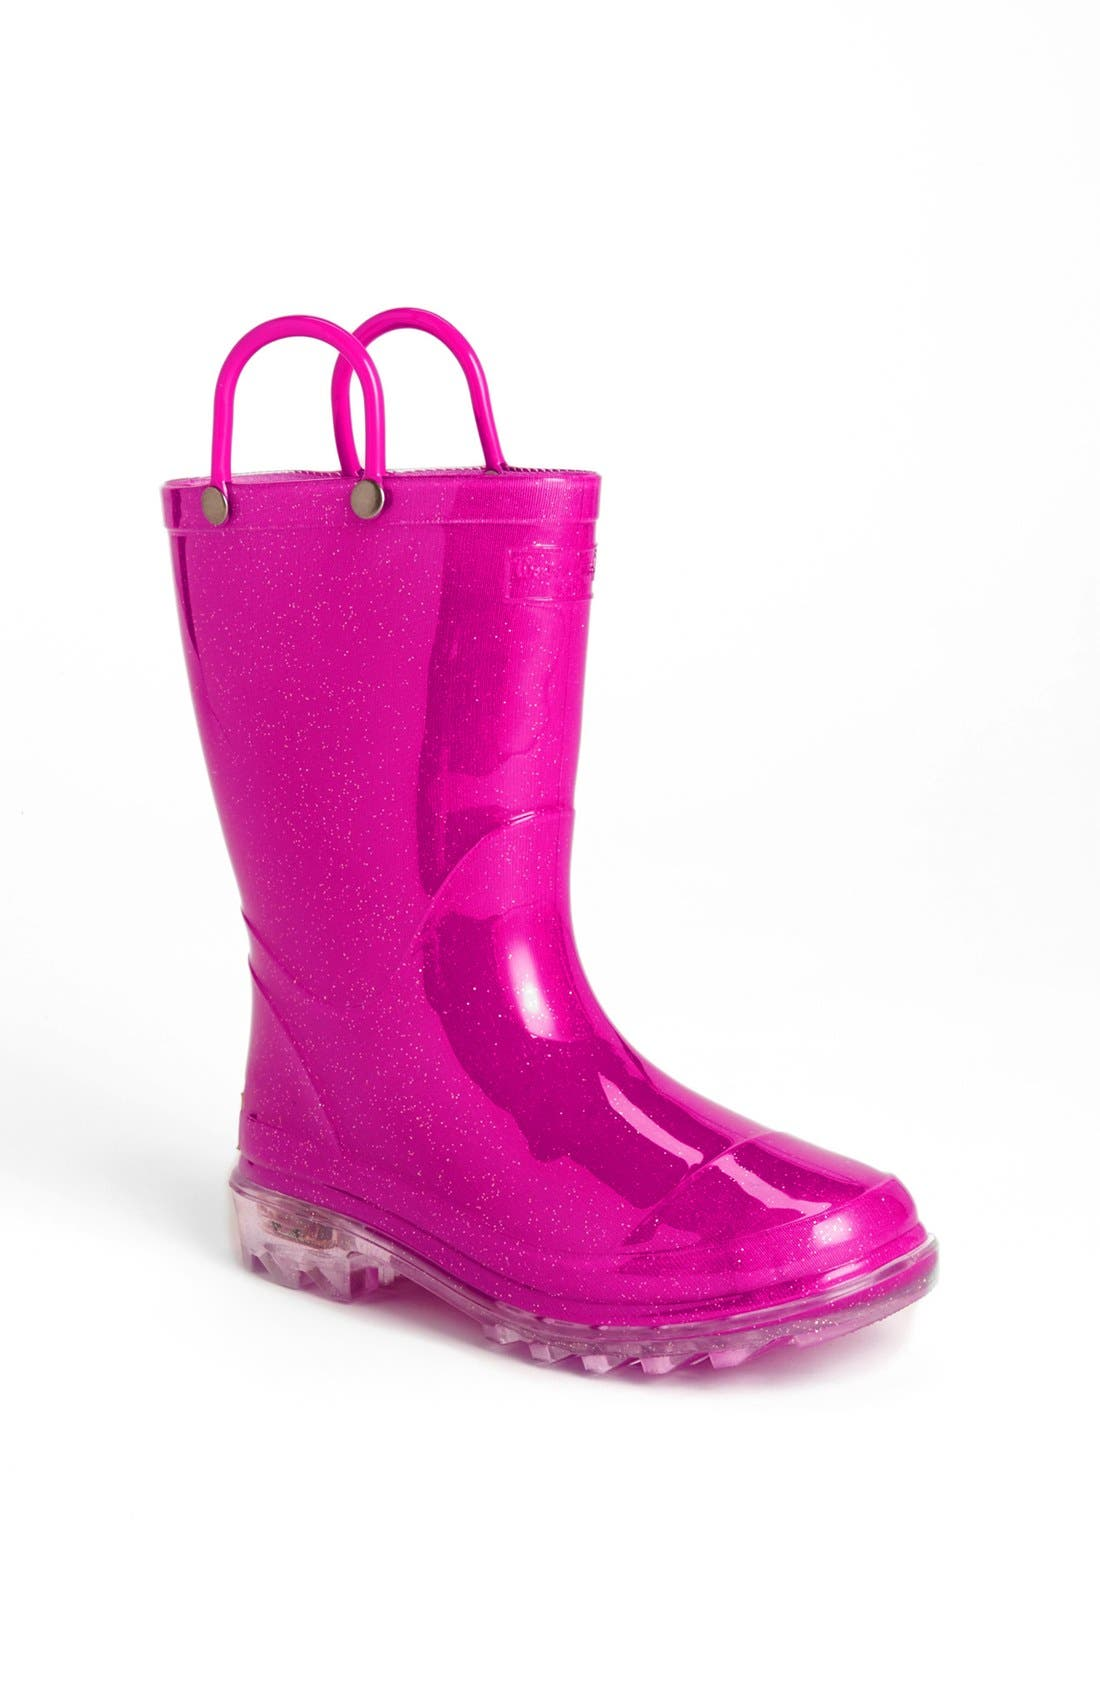 Main Image - Western Chief Light-Up Glitter Rain Boot (Toddler & Little Kid)